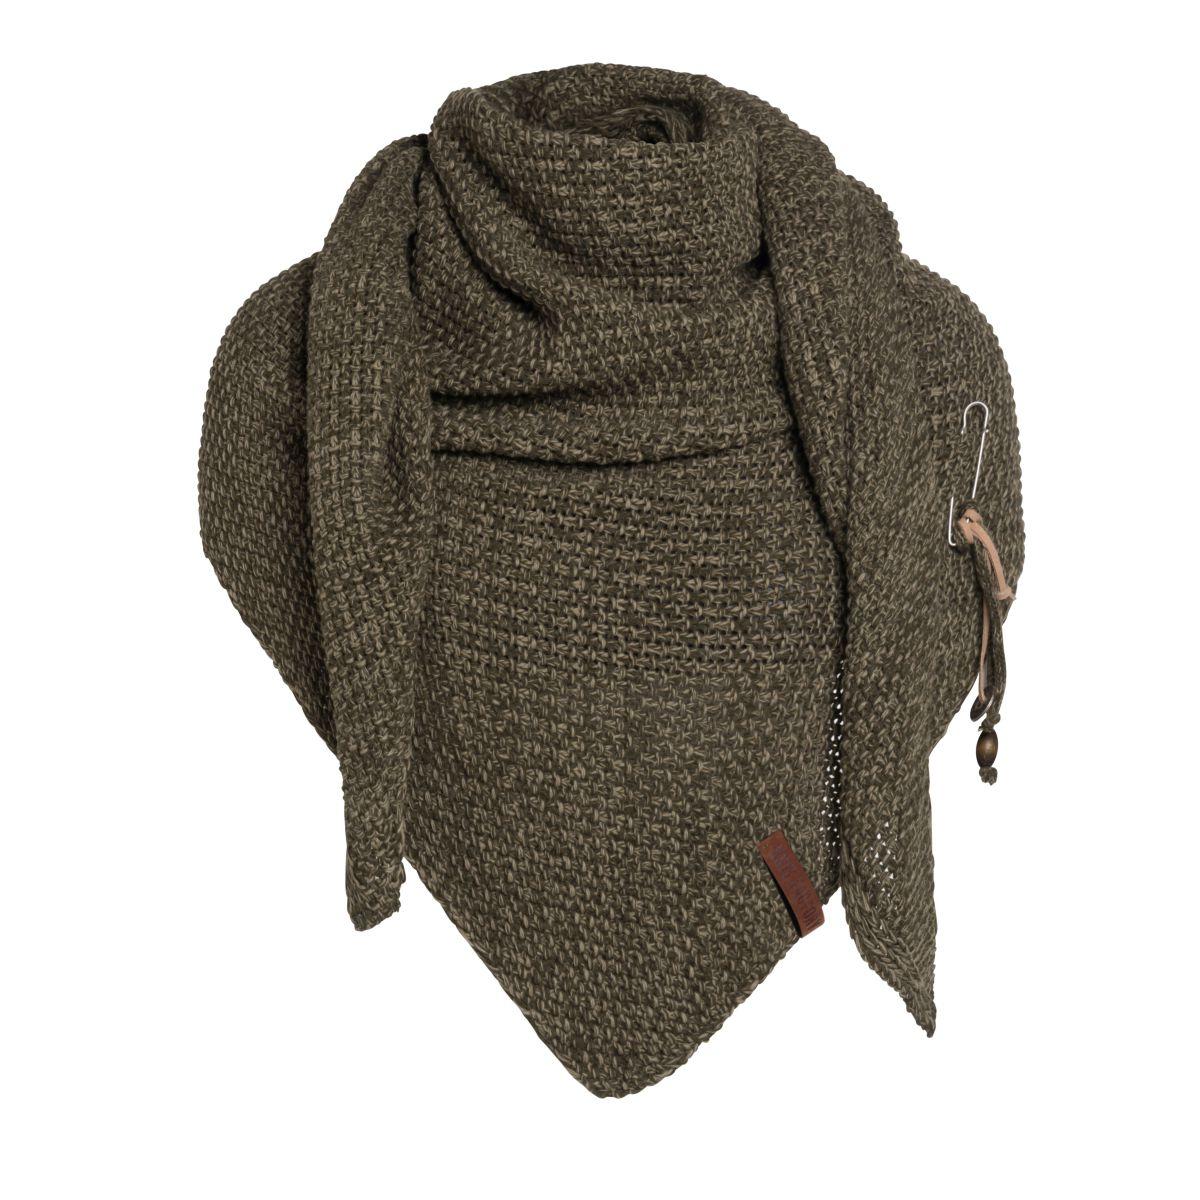 knit factory 1206044 coco omslagdoek groen olive 1